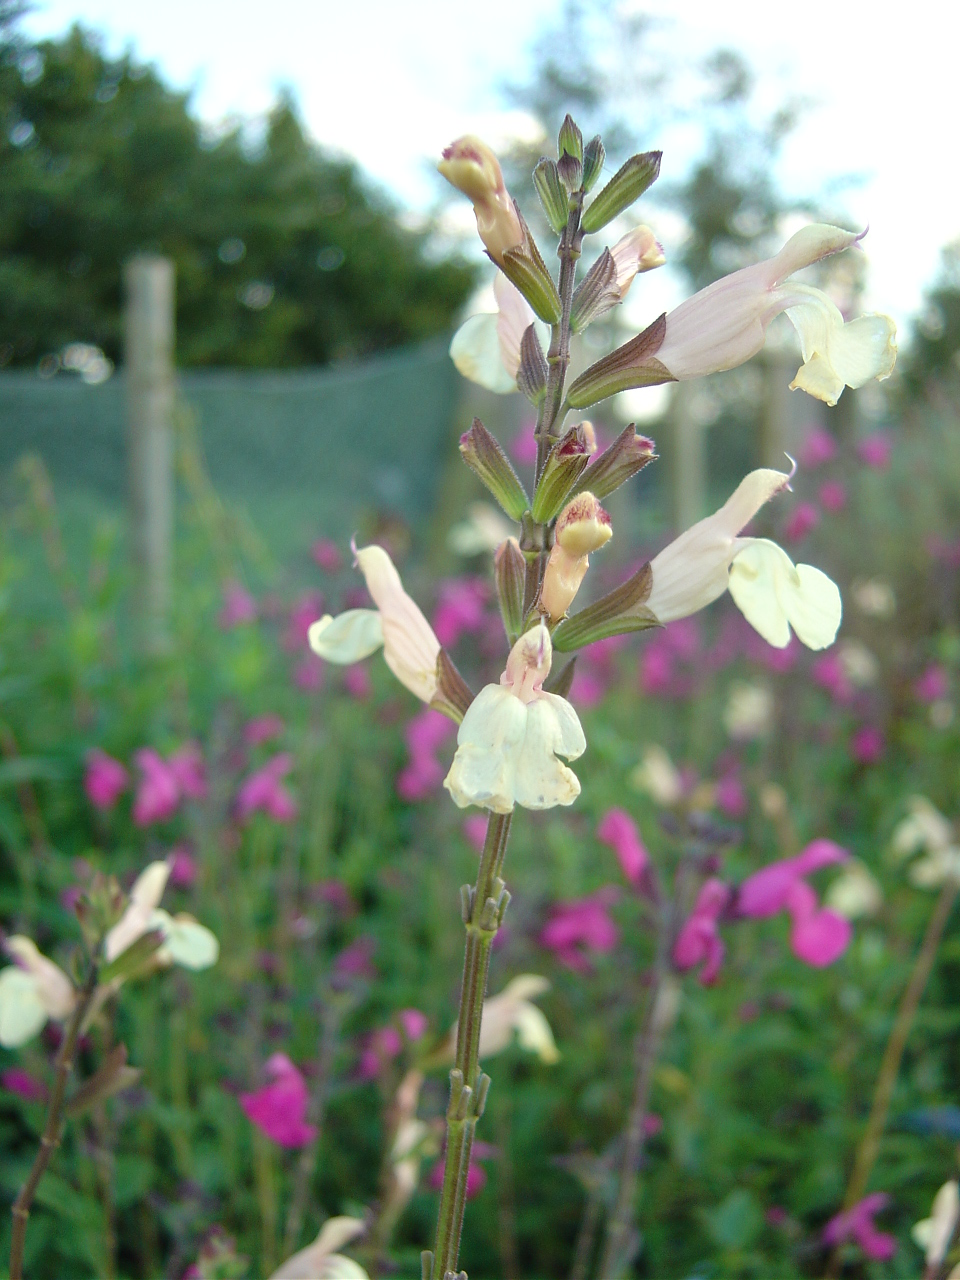 Redman hardy plants salvia microphylla 39 trelissick 39 3 for 12 - Hardy houseplants ...